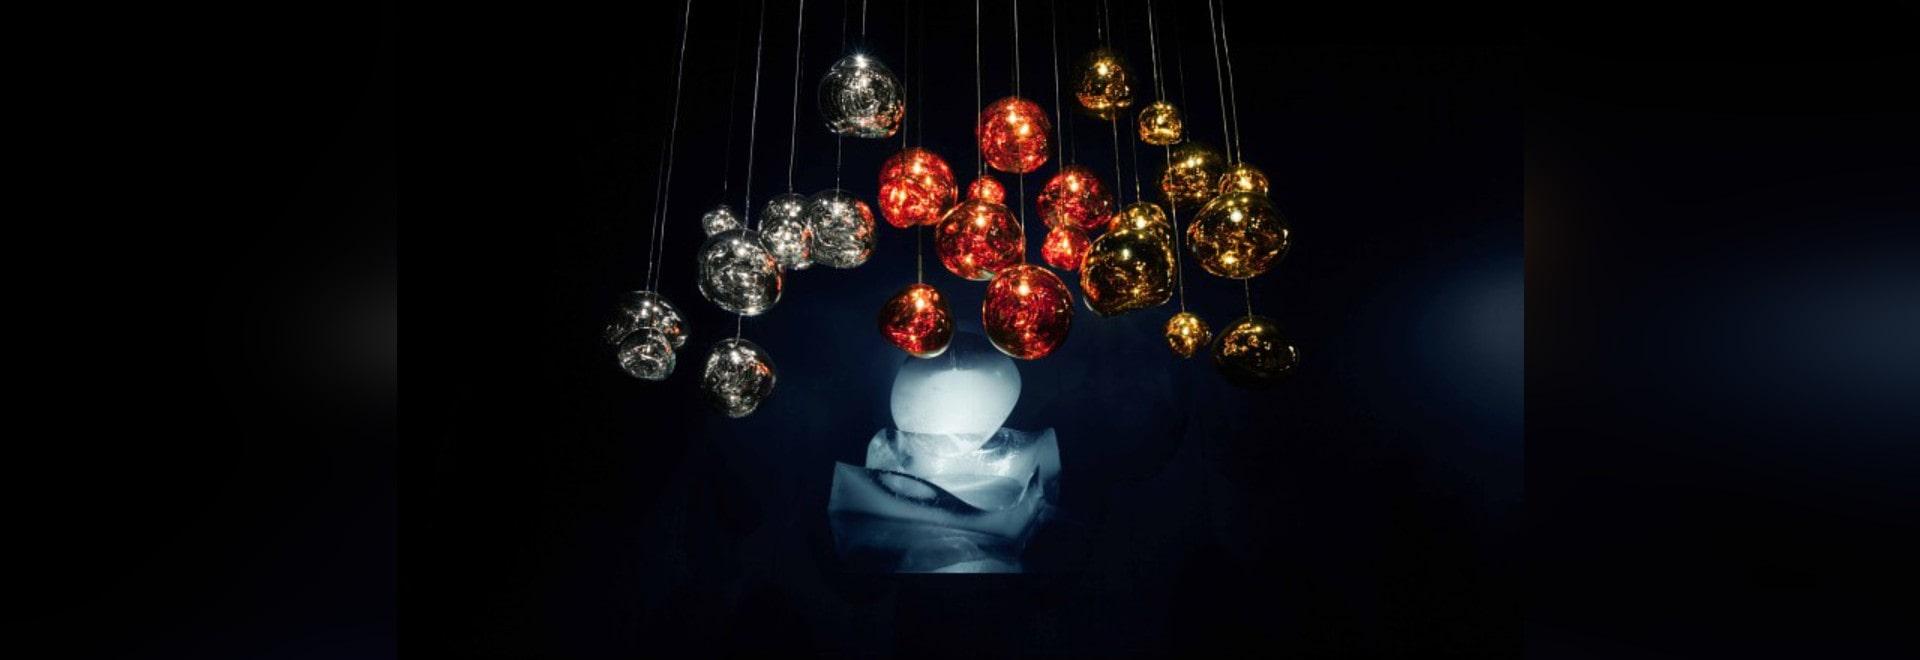 MILAN 2015: TOM DIXON PRESENTS MELT LIGHT AT THE CINEMA